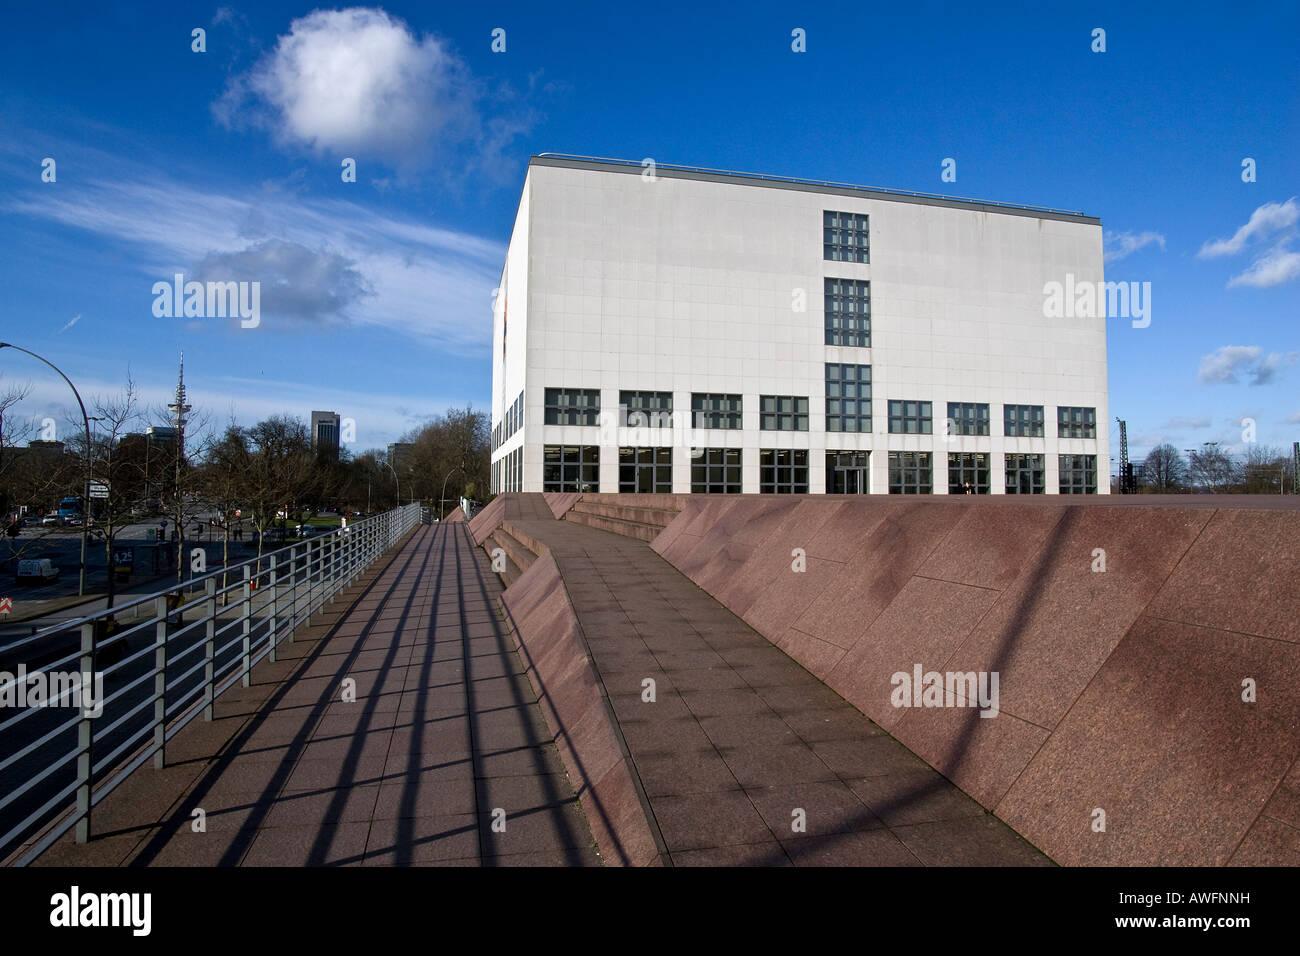 New building of the art museum Hamburger Kunsthalle - Gallery of the present - city of Hamburg - Hamburg, Germany, - Stock Image